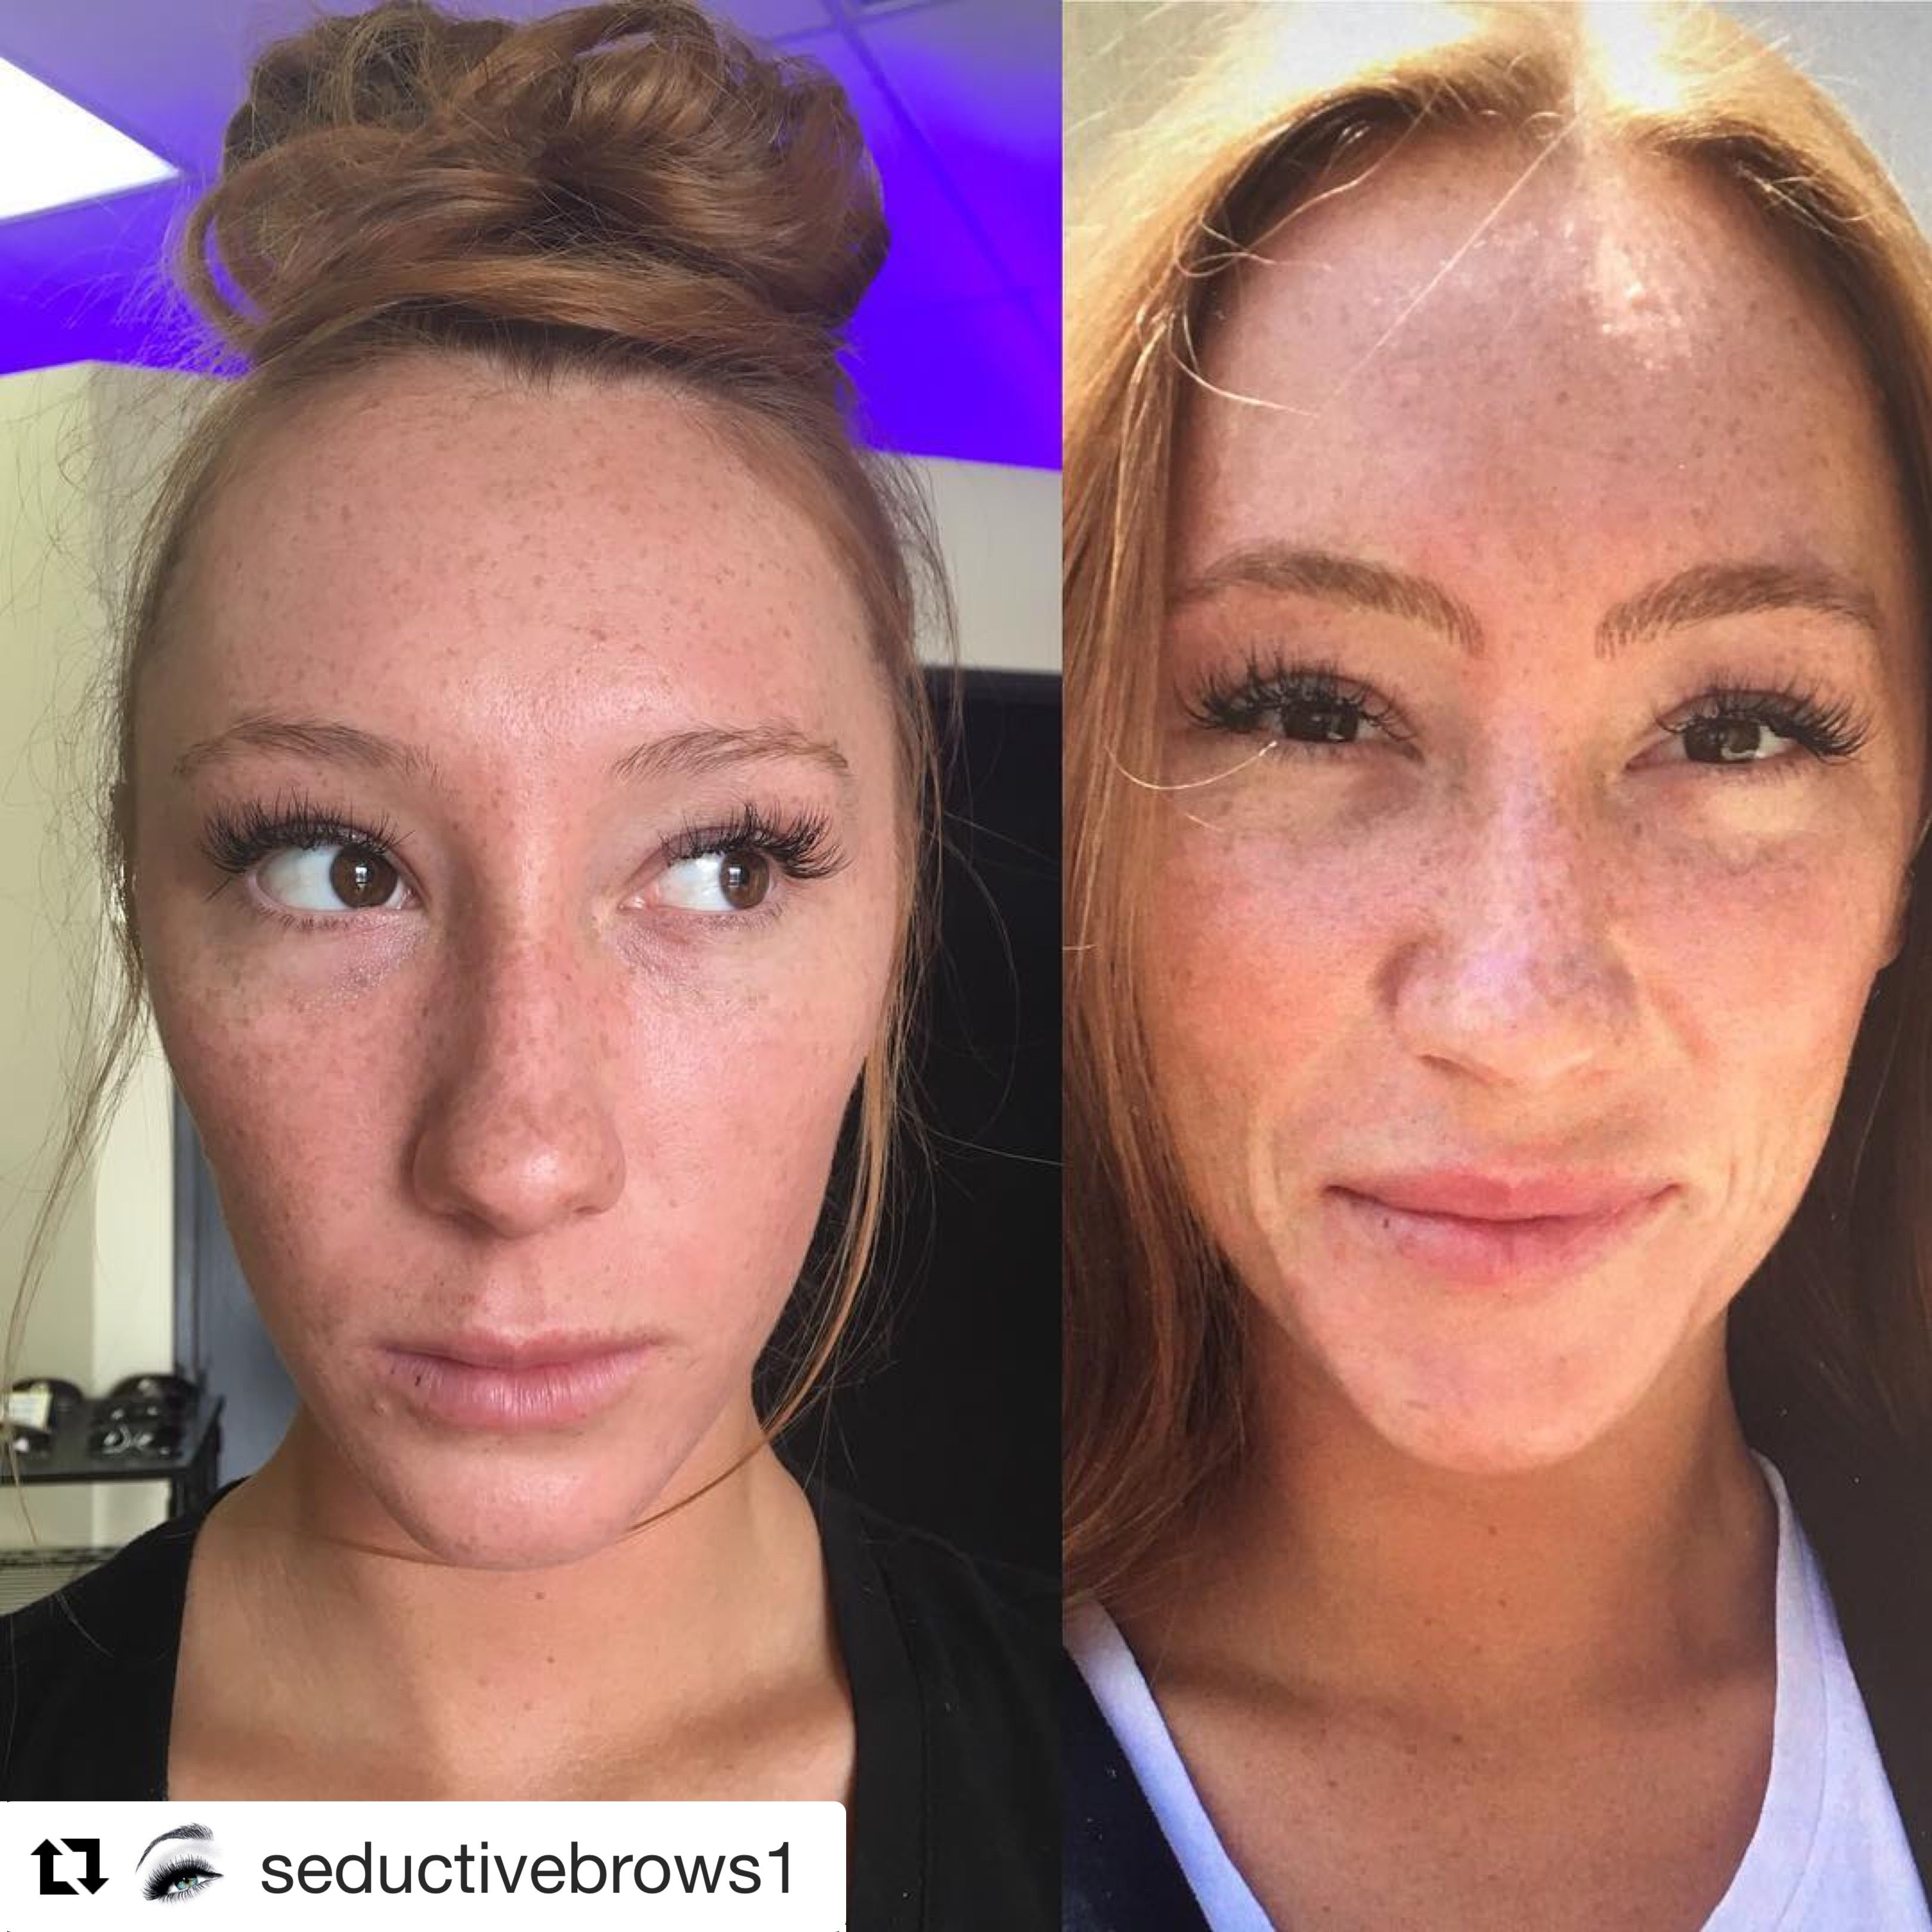 Redhead Brows Permanent makeup supplies, Permanent